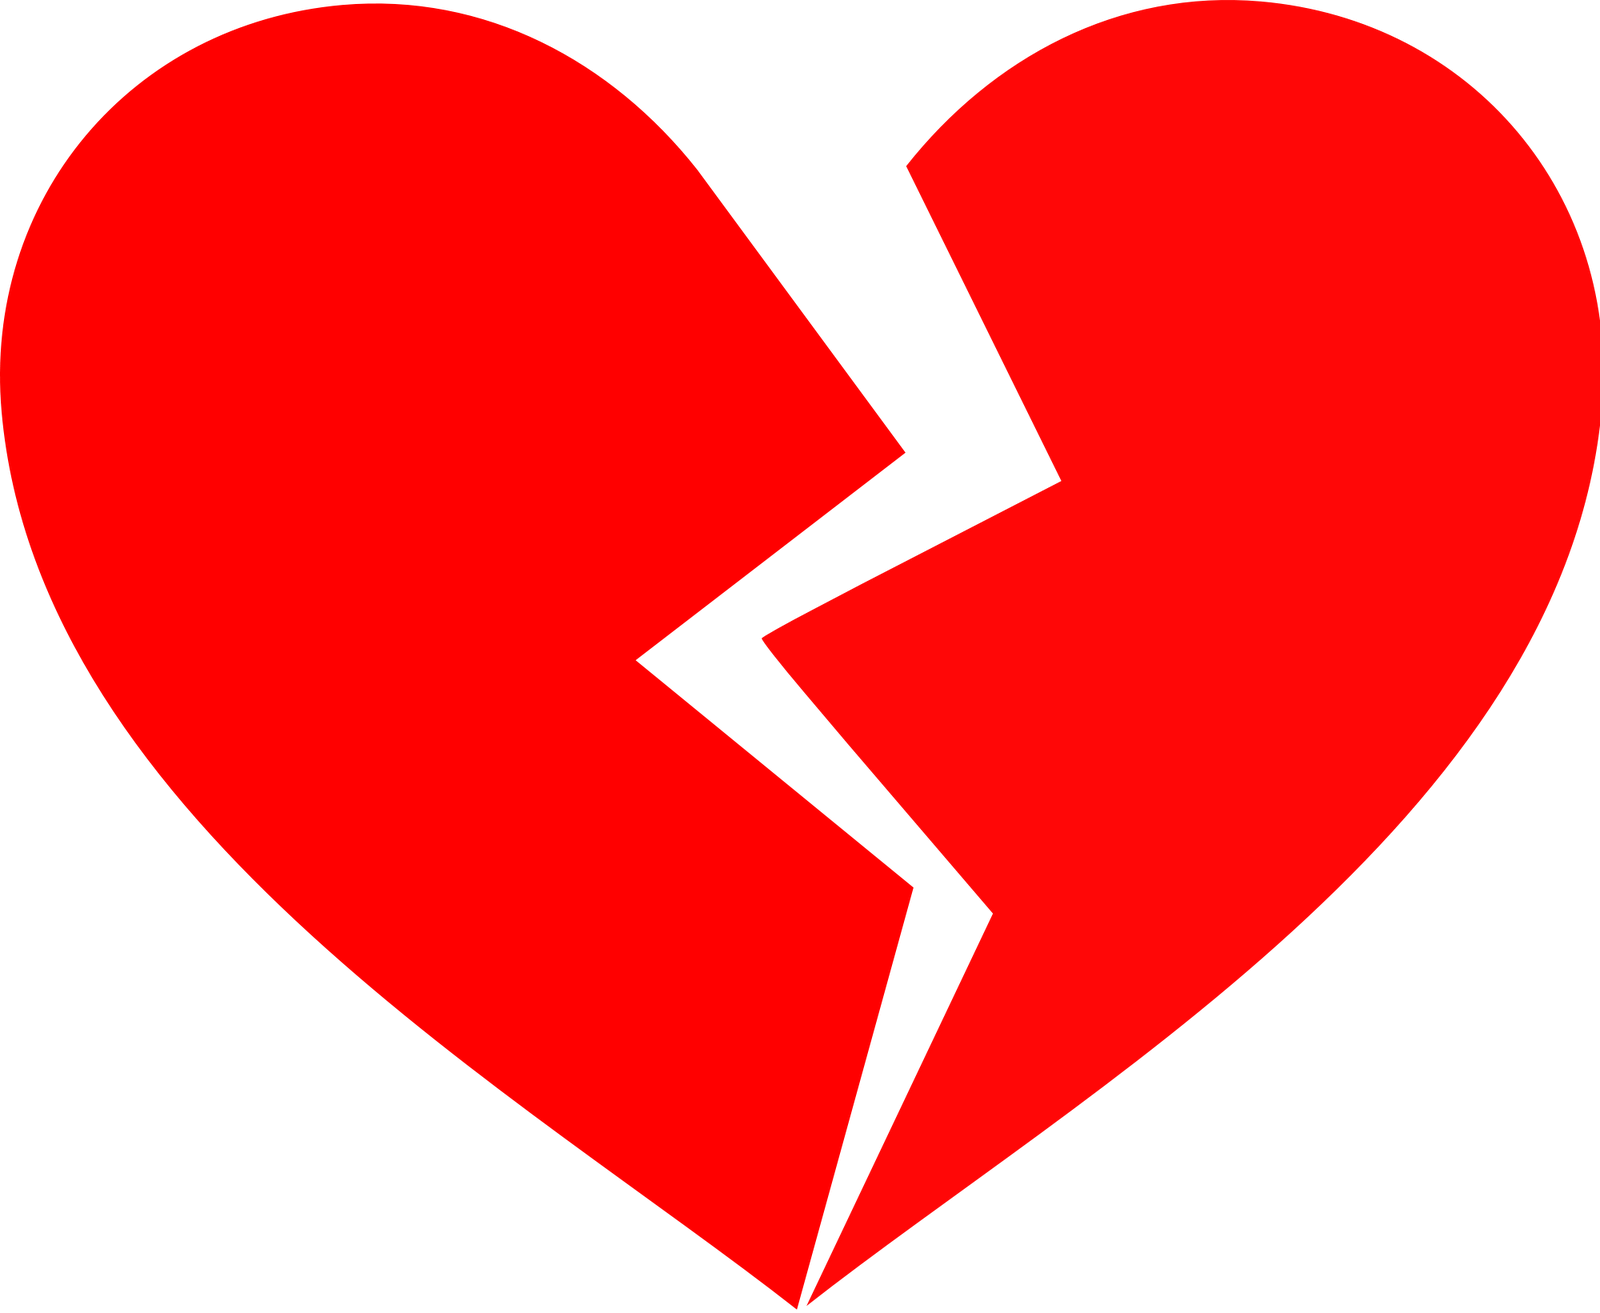 Heart clipart black banner transparent stock Free Heart Halves Cliparts, Download Free Clip Art, Free Clip Art on ... banner transparent stock